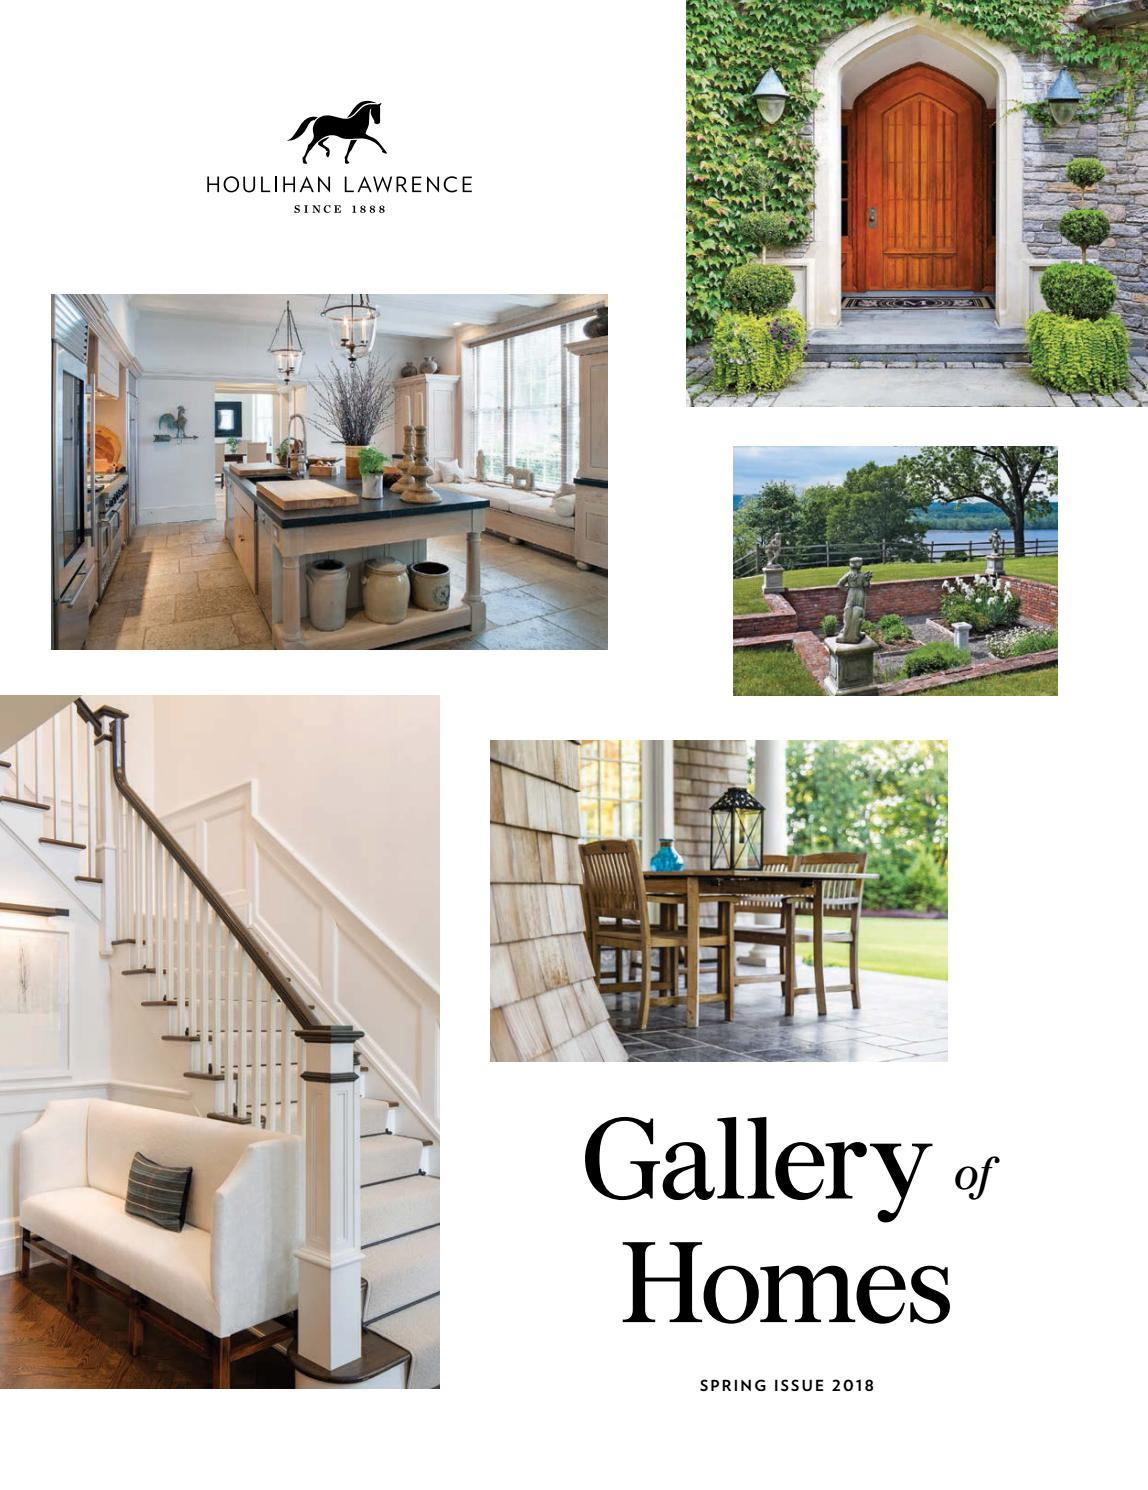 Houlihan Lawrence Gallery of Homes Spring 2018 by Houlihan Lawrence ...